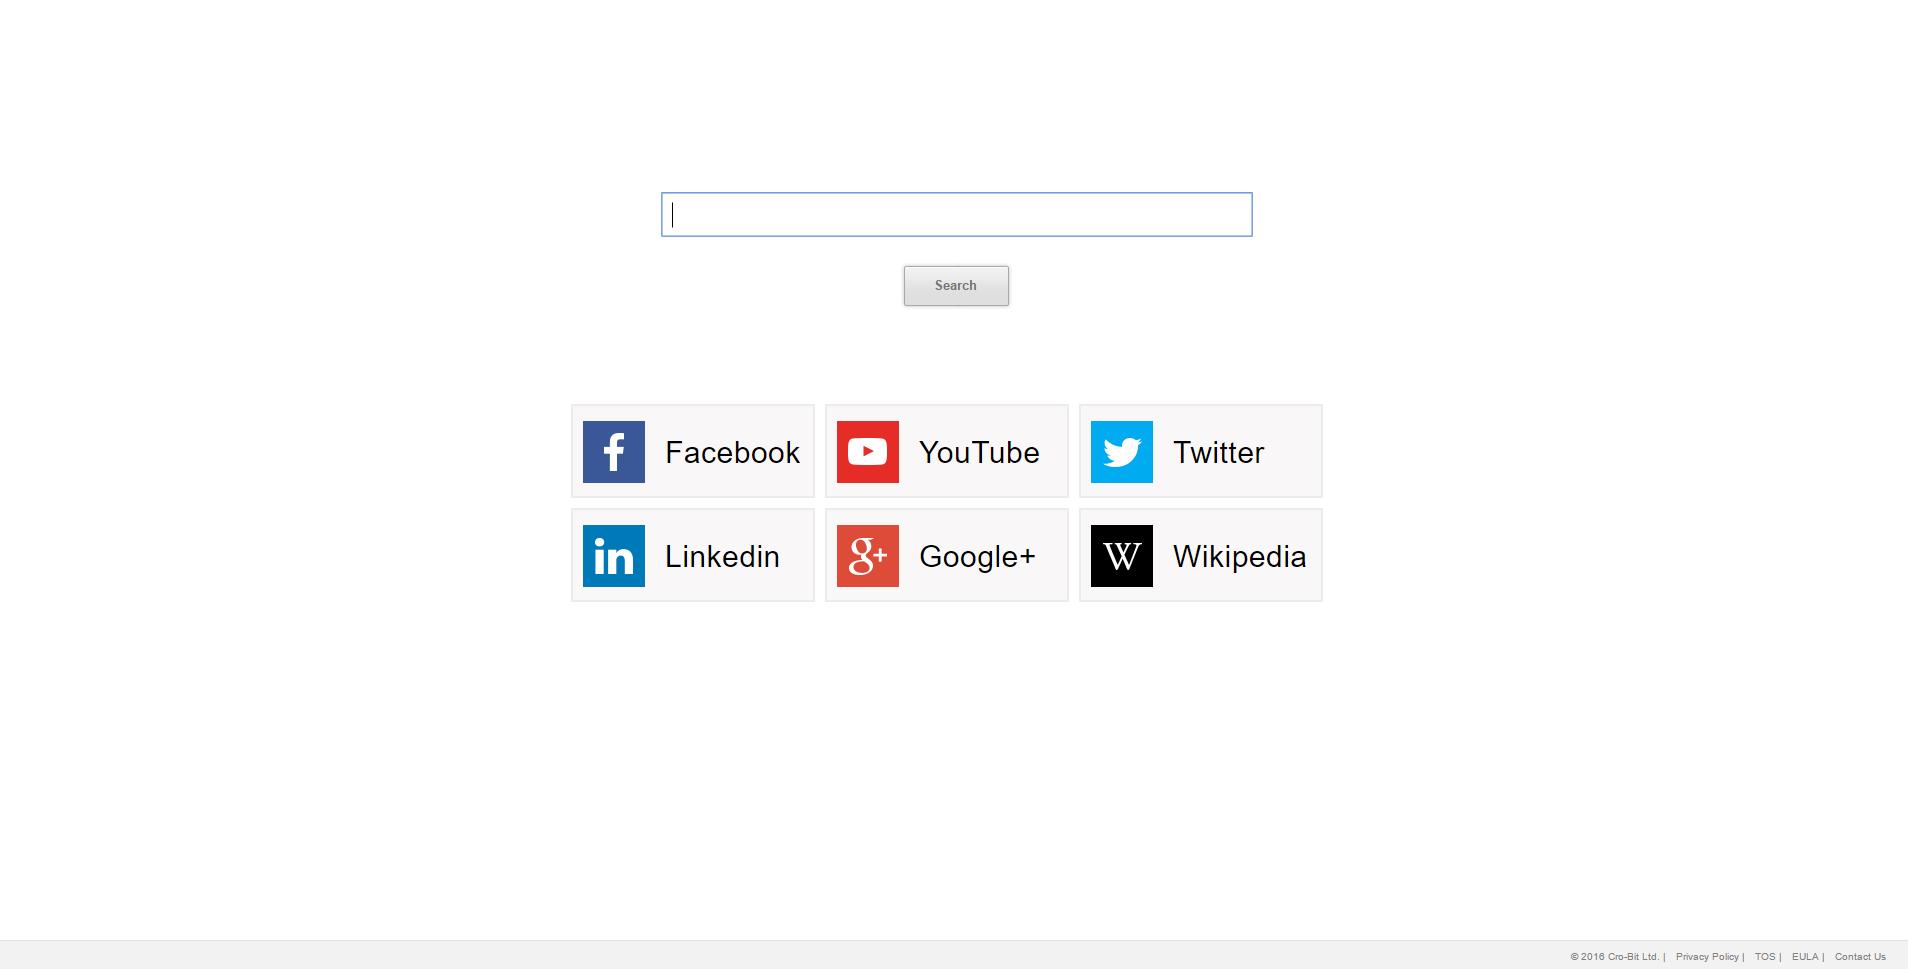 Searchengage.com Ads